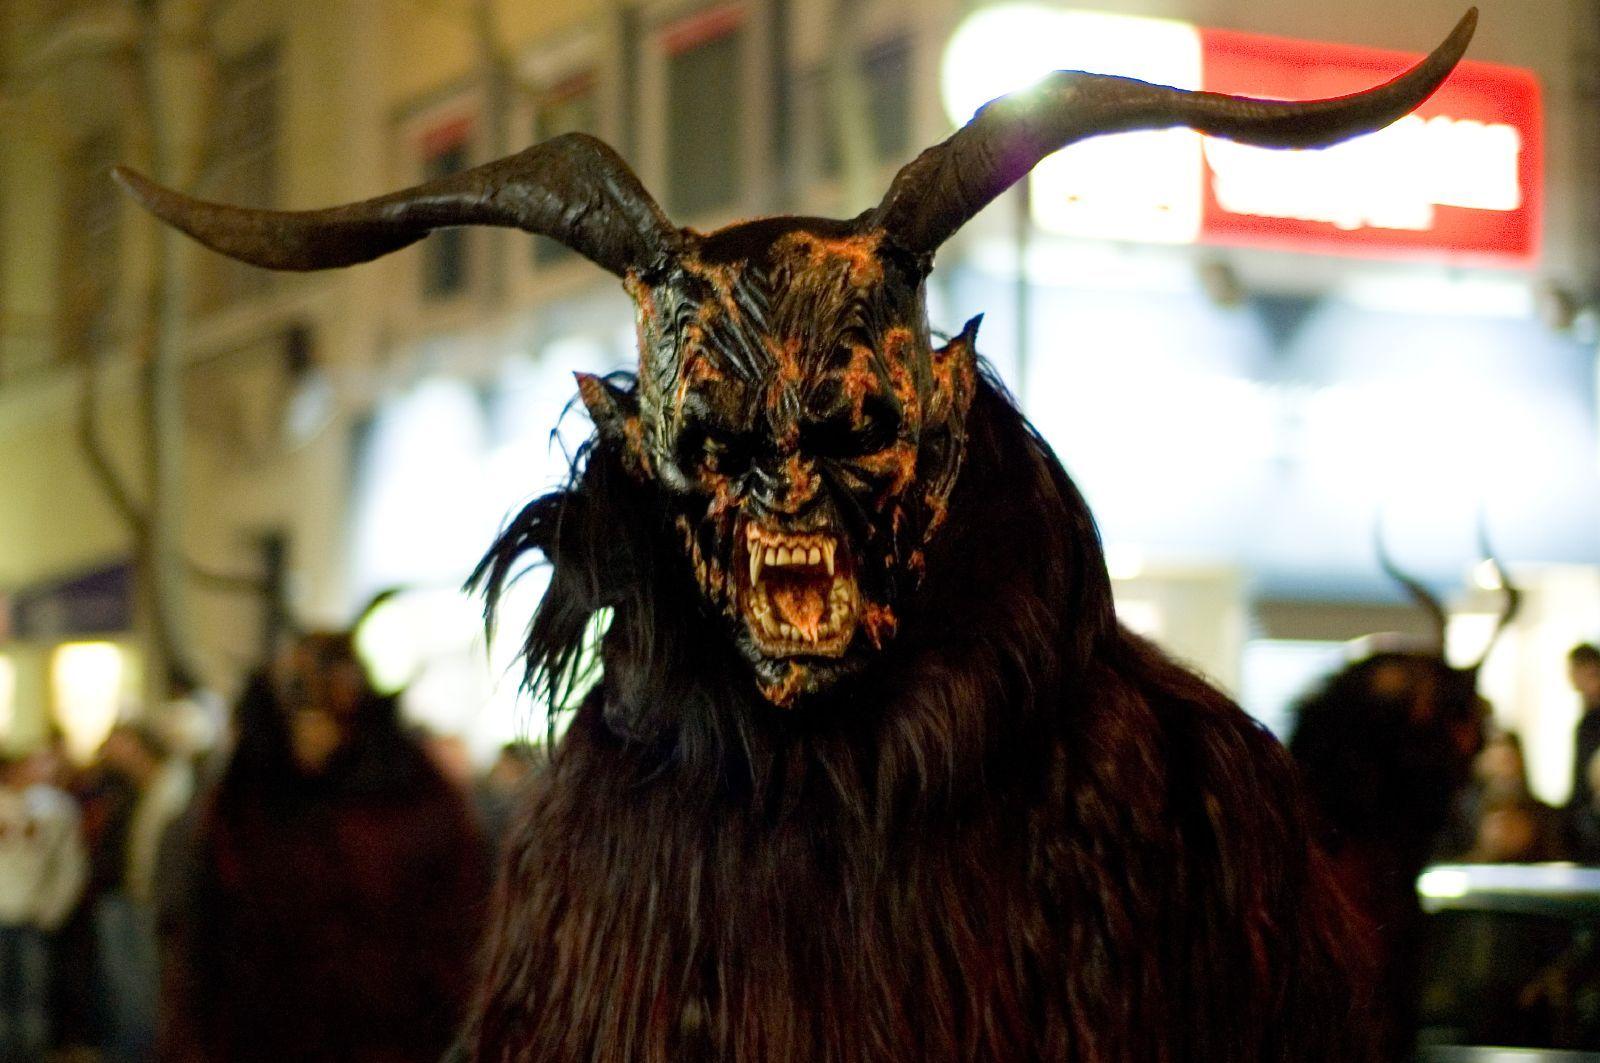 SantaCon Costume - Krampus Night is Coming! | Blood Curdling Blog ...